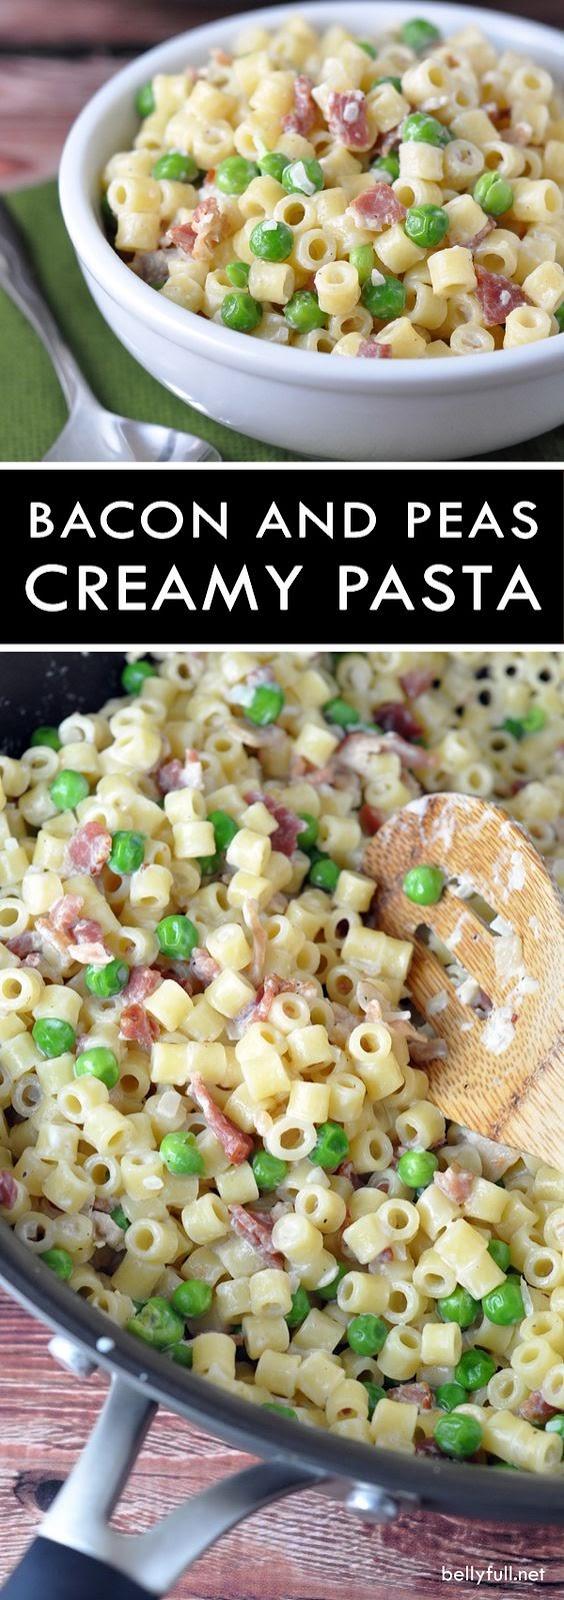 Creamy Pasta with Bacon and Peas | CUCINA DE YUNG